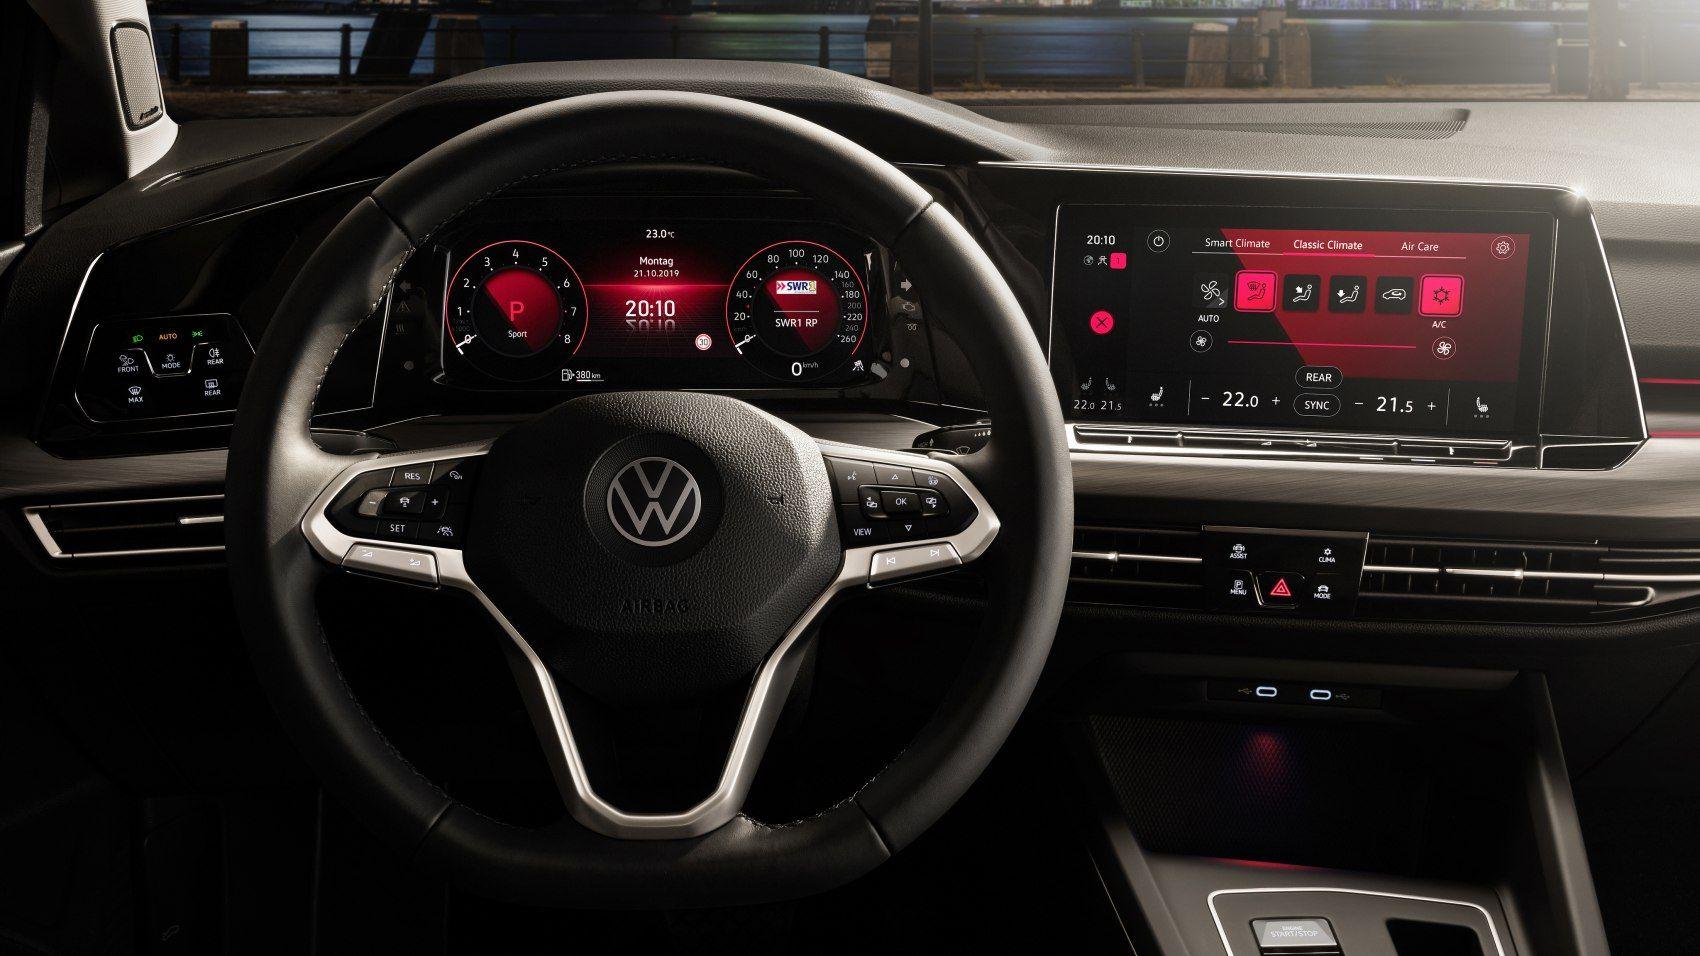 Volkswagen Golf Golf Viii 1 5 Tsi 150 Hp Petrol Gasoline 2020 Golf Viii 1 5 Tsi 150 Hp P Volkswagen Golf Volkswagen Volkswagen Passat